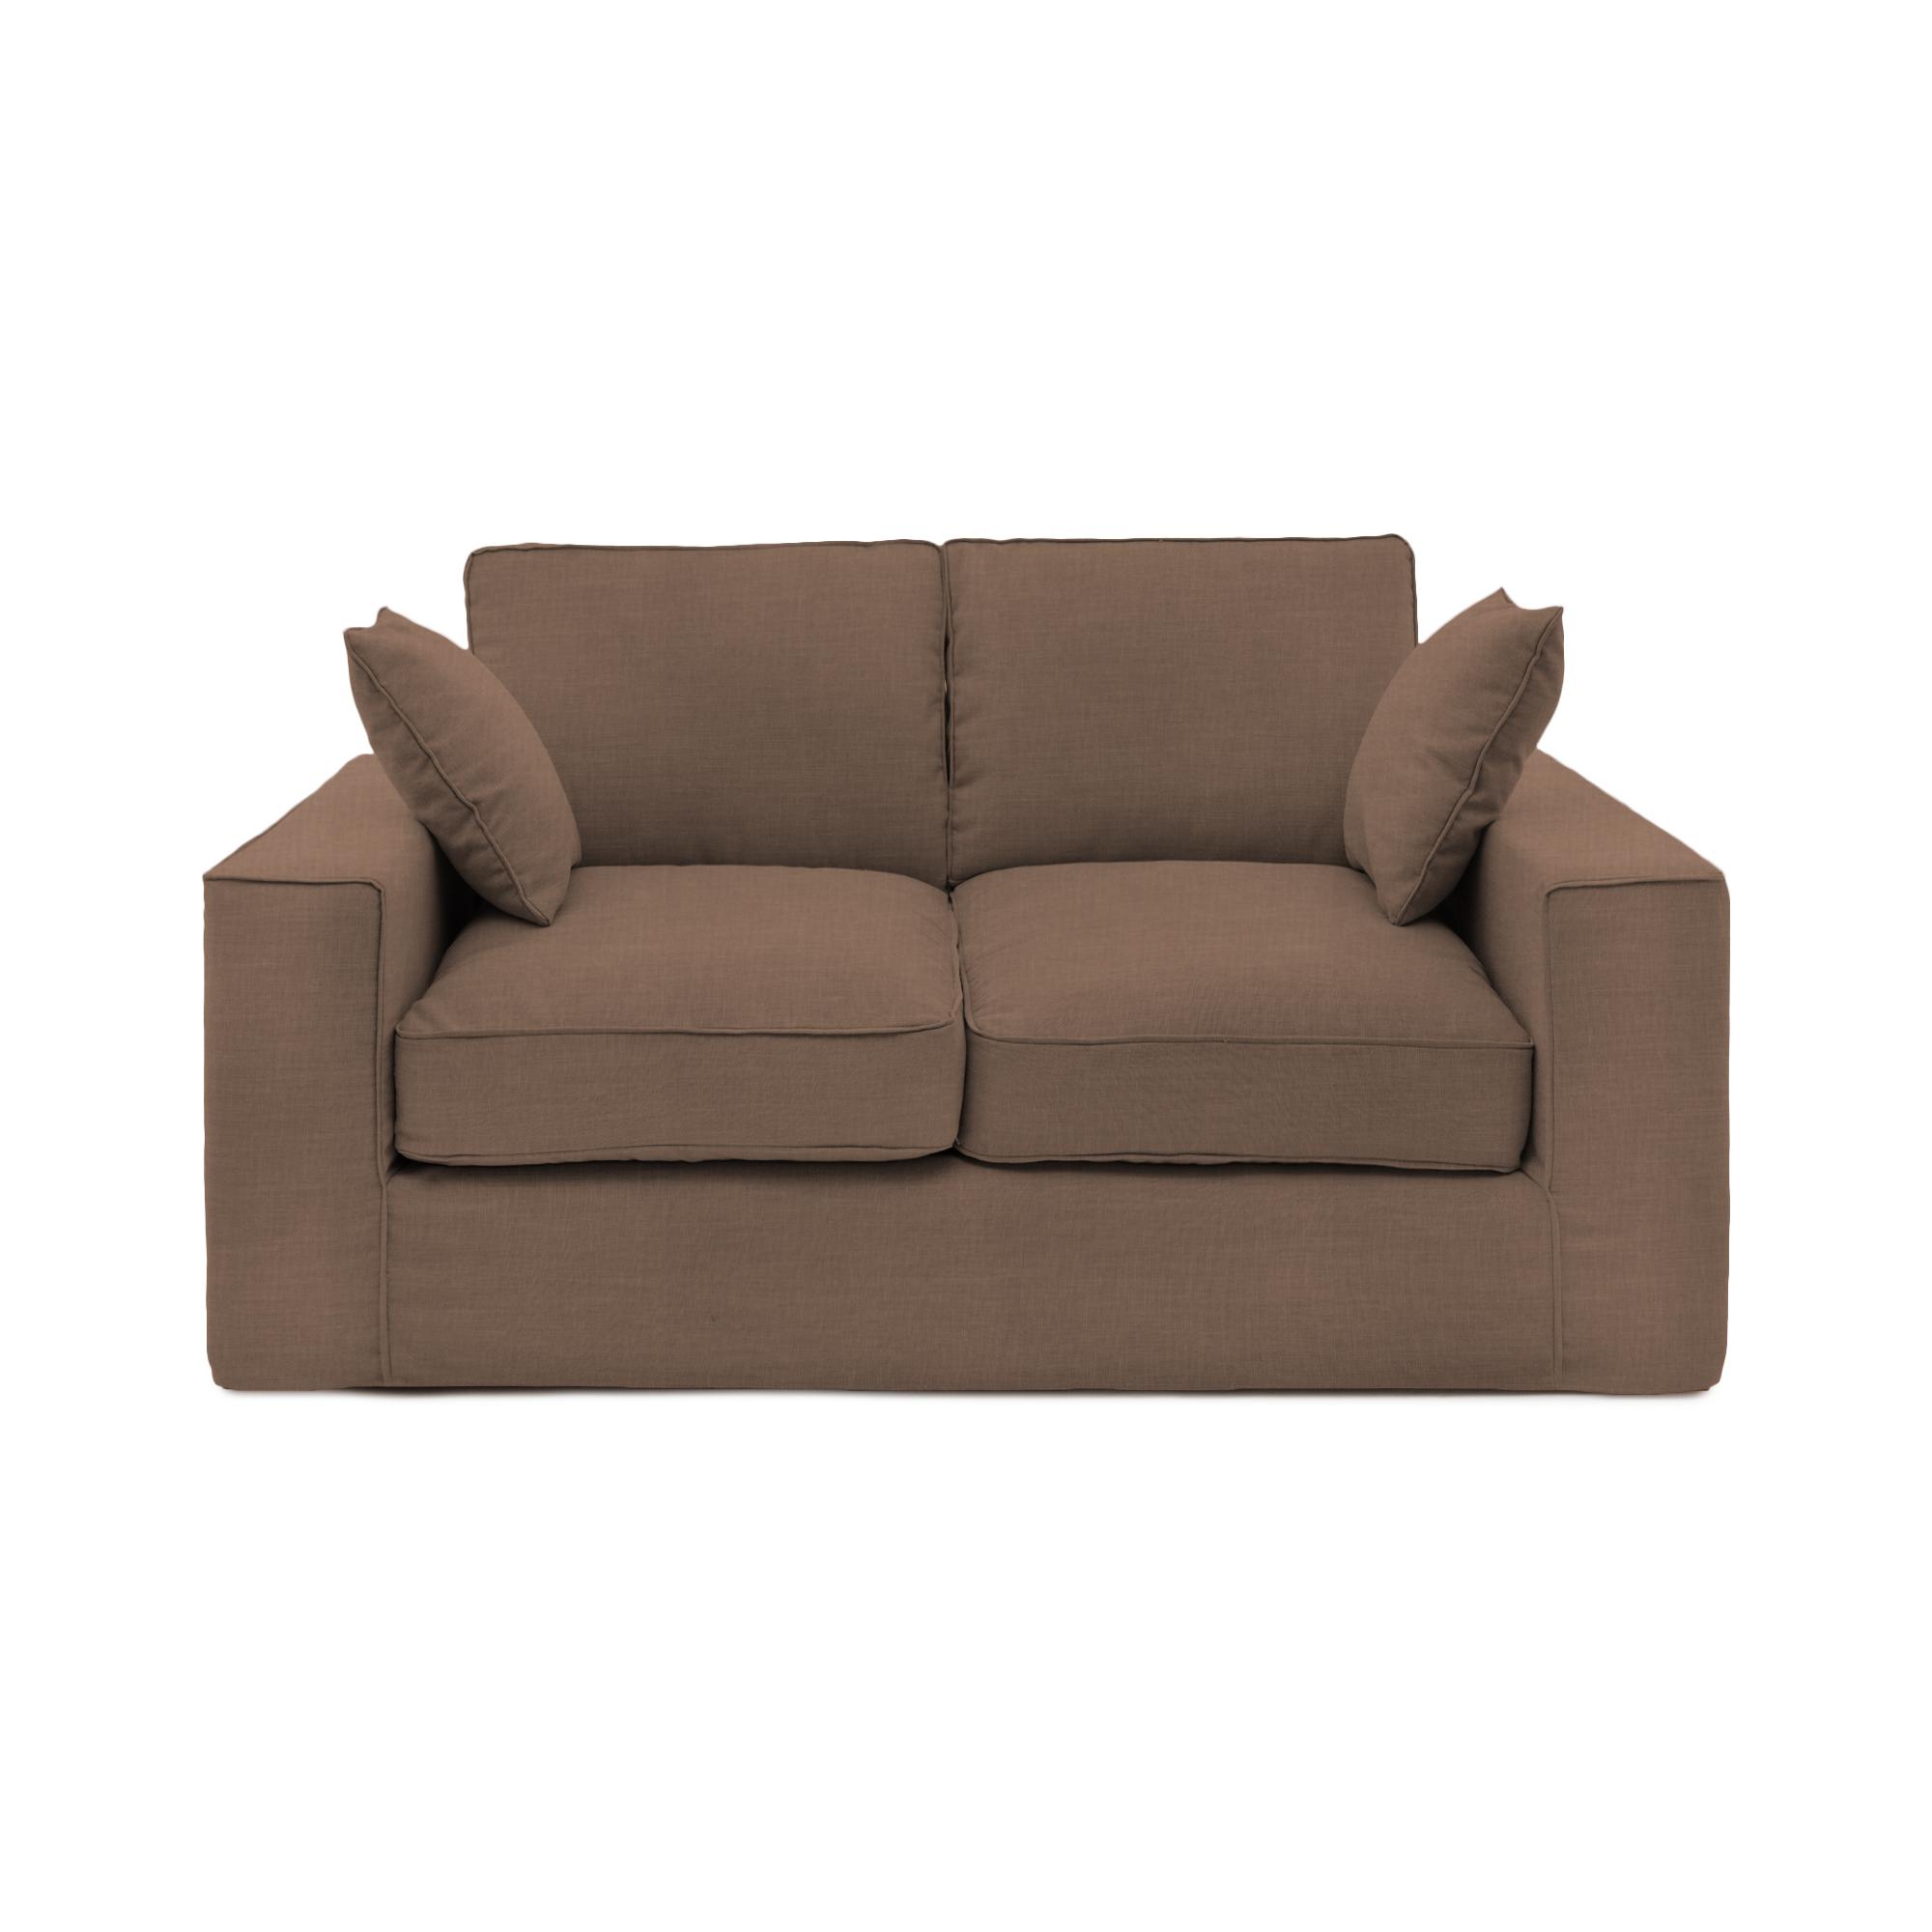 Canapea Fixa 2 locuri Jane Brown